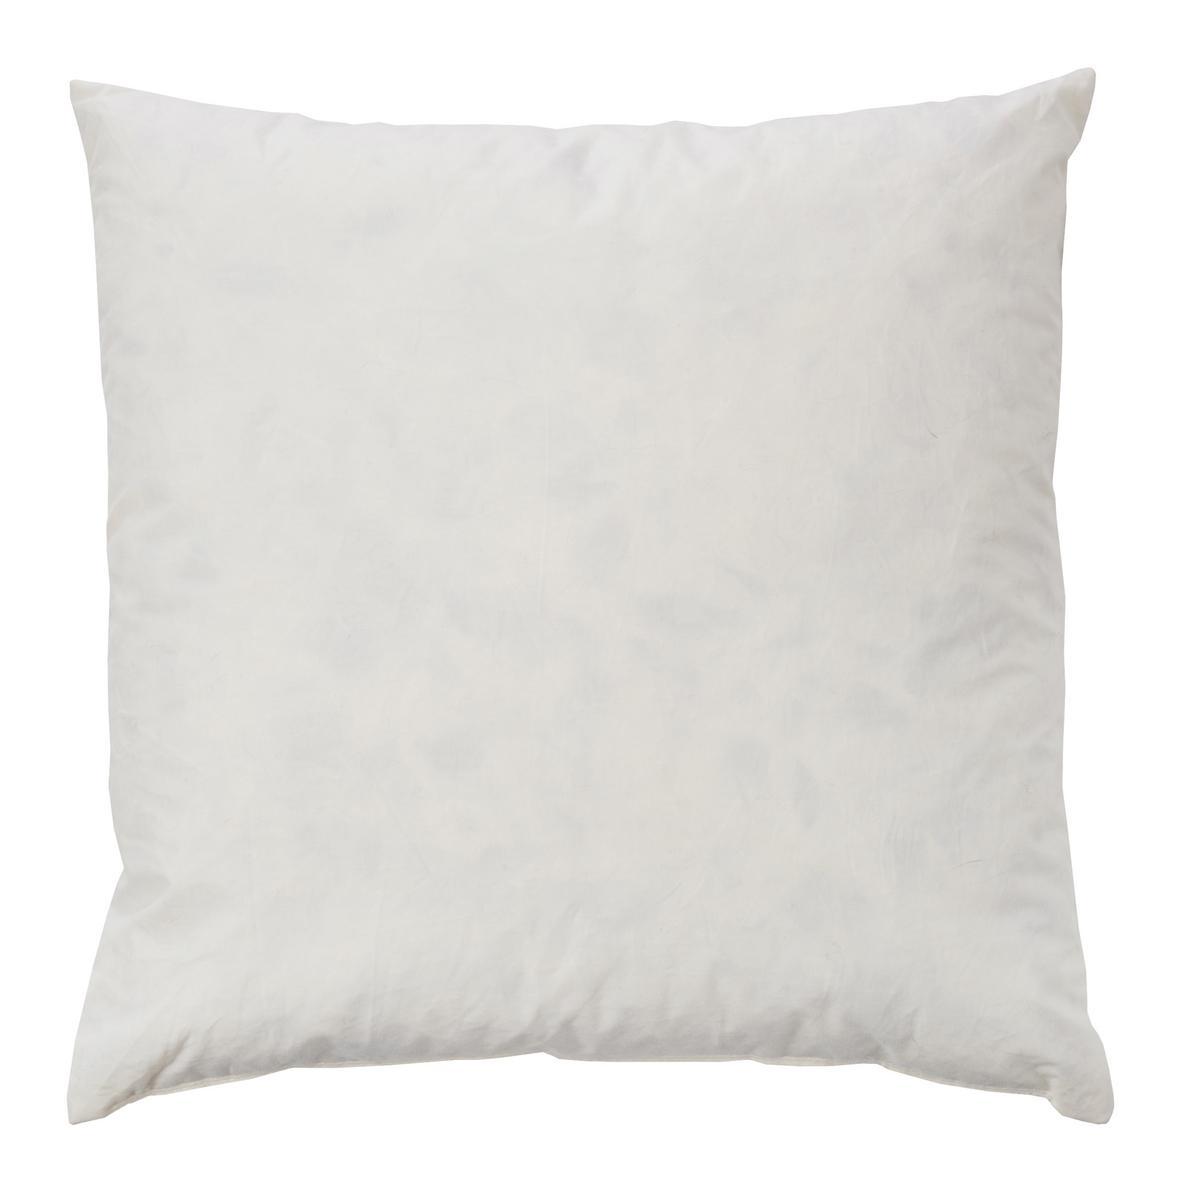 eagle products f llung mit hohlfaser f r kissen 40 x 40 cm. Black Bedroom Furniture Sets. Home Design Ideas